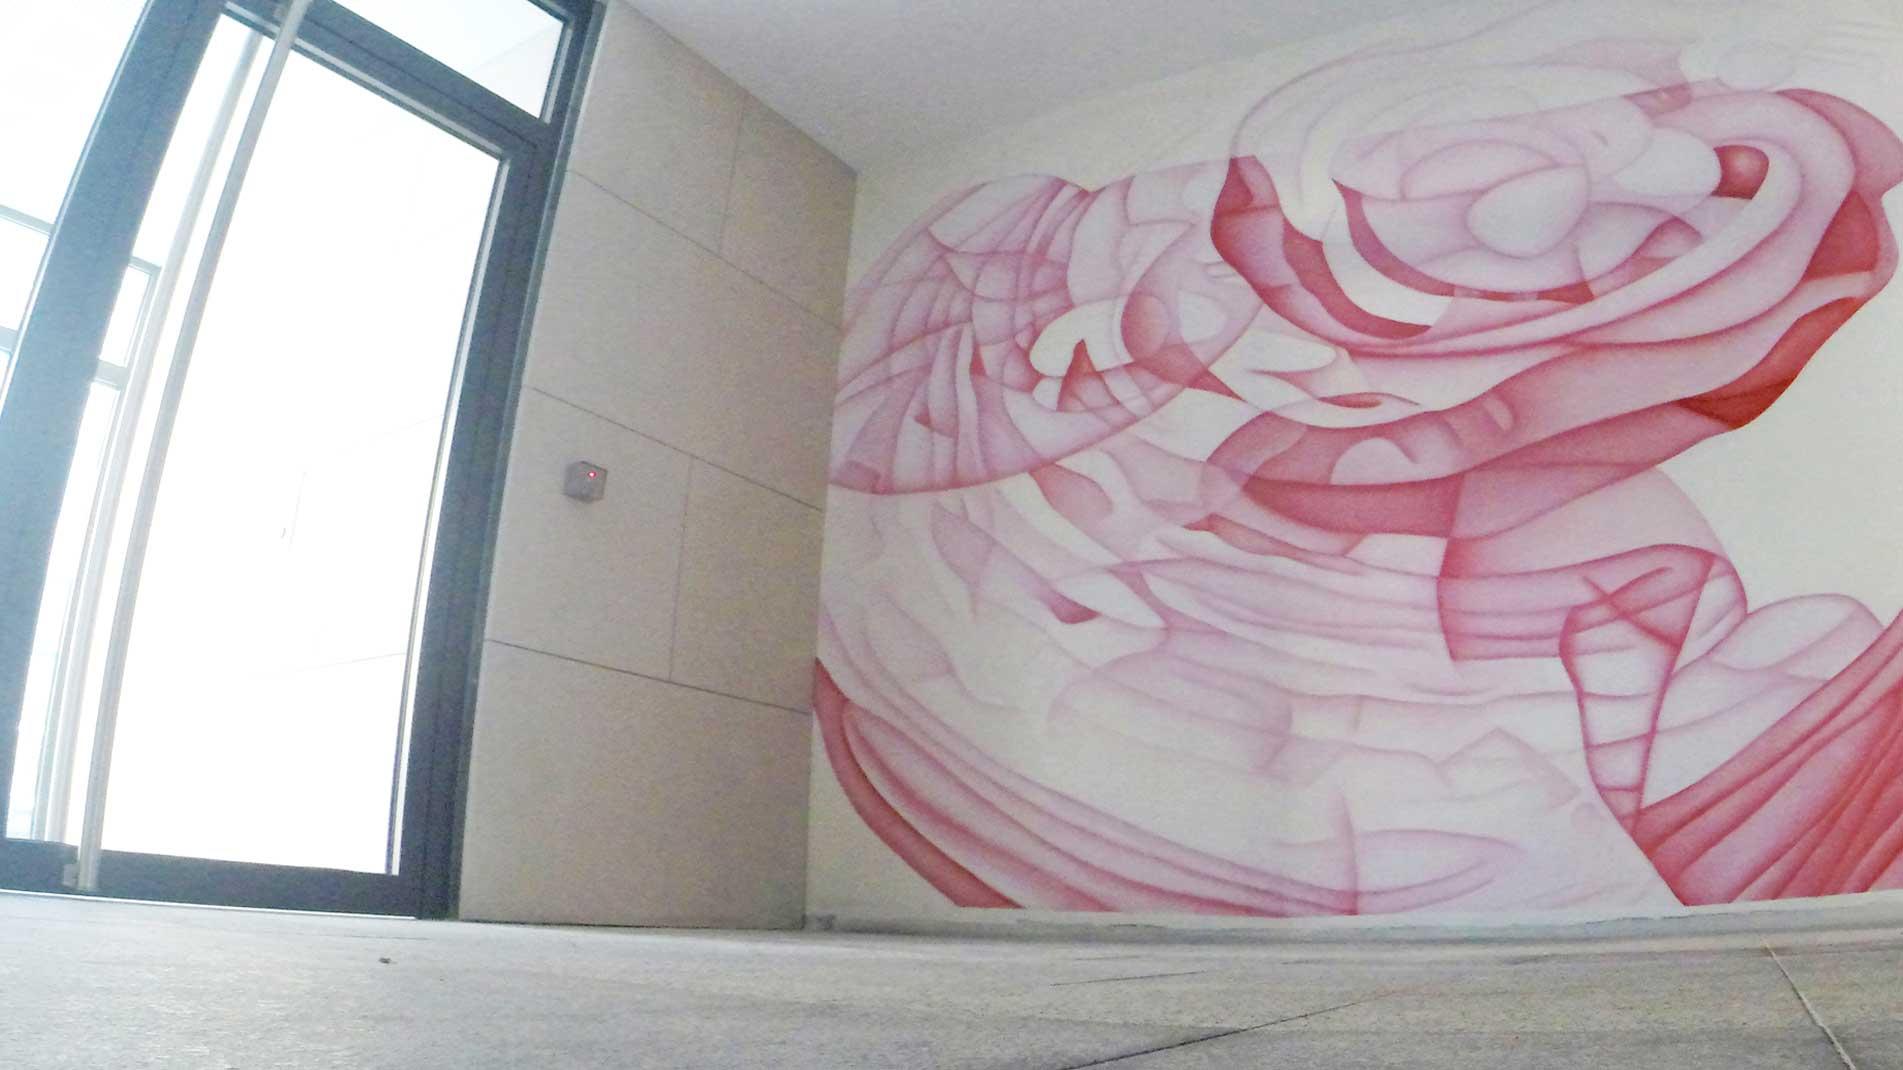 Bottazzi, art in public space, Marseille